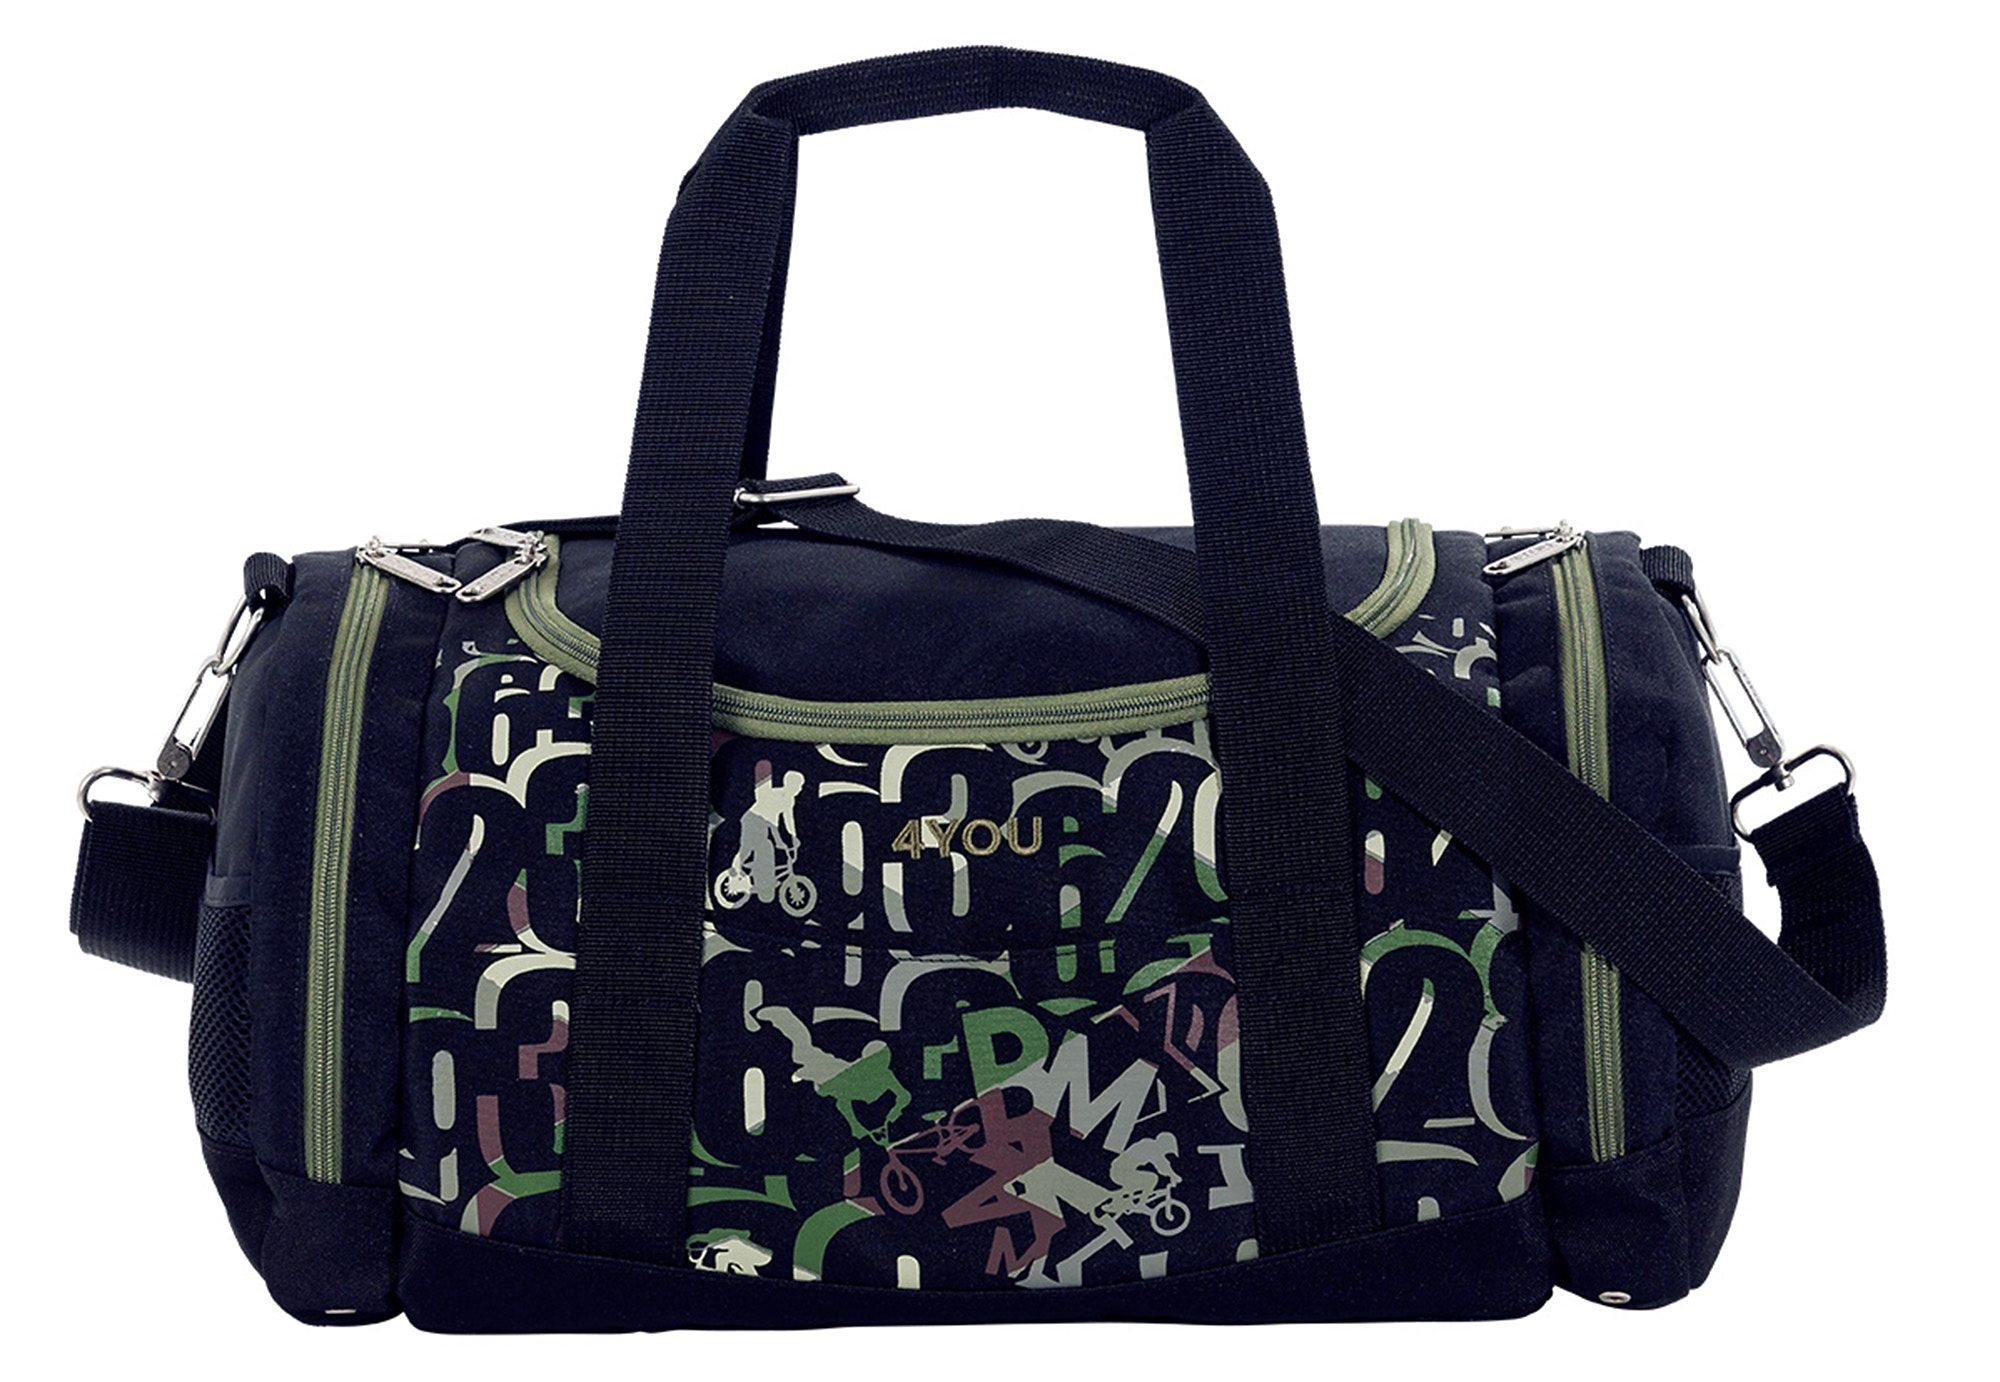 4YOU Sporttasche, BMX, »Sportbag Function«